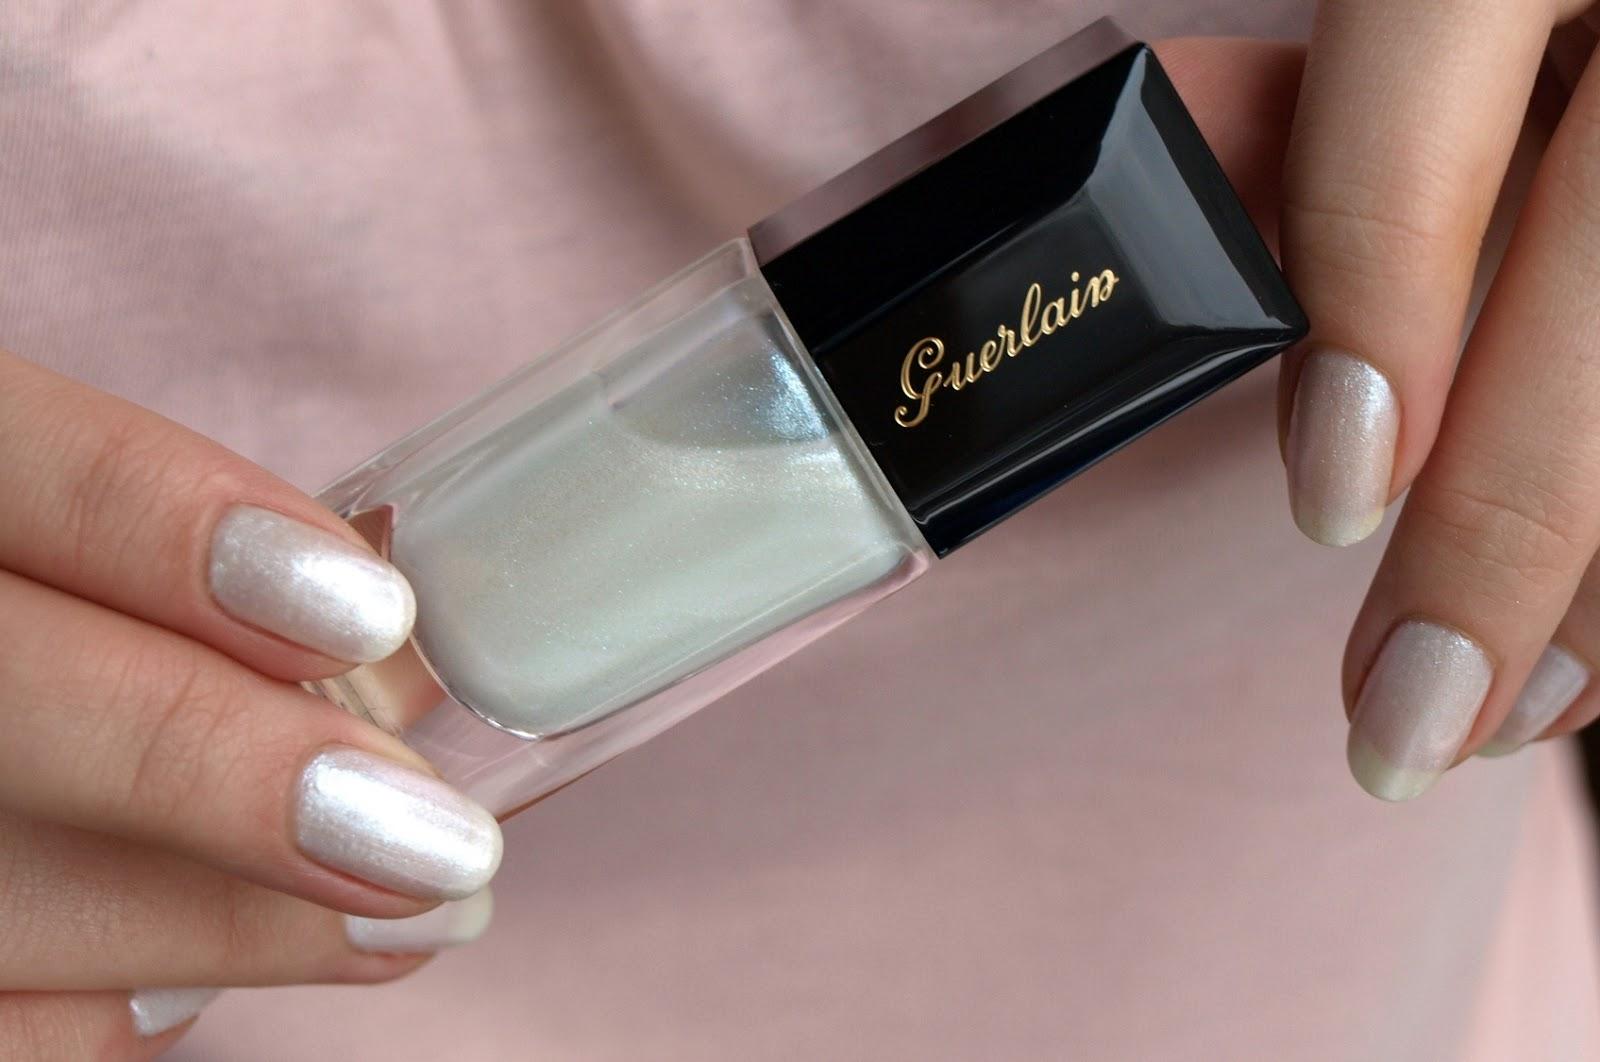 Star dust nail lacquer guerlain 25 -  Guerlain Colour Lacquer 862 Star Dust